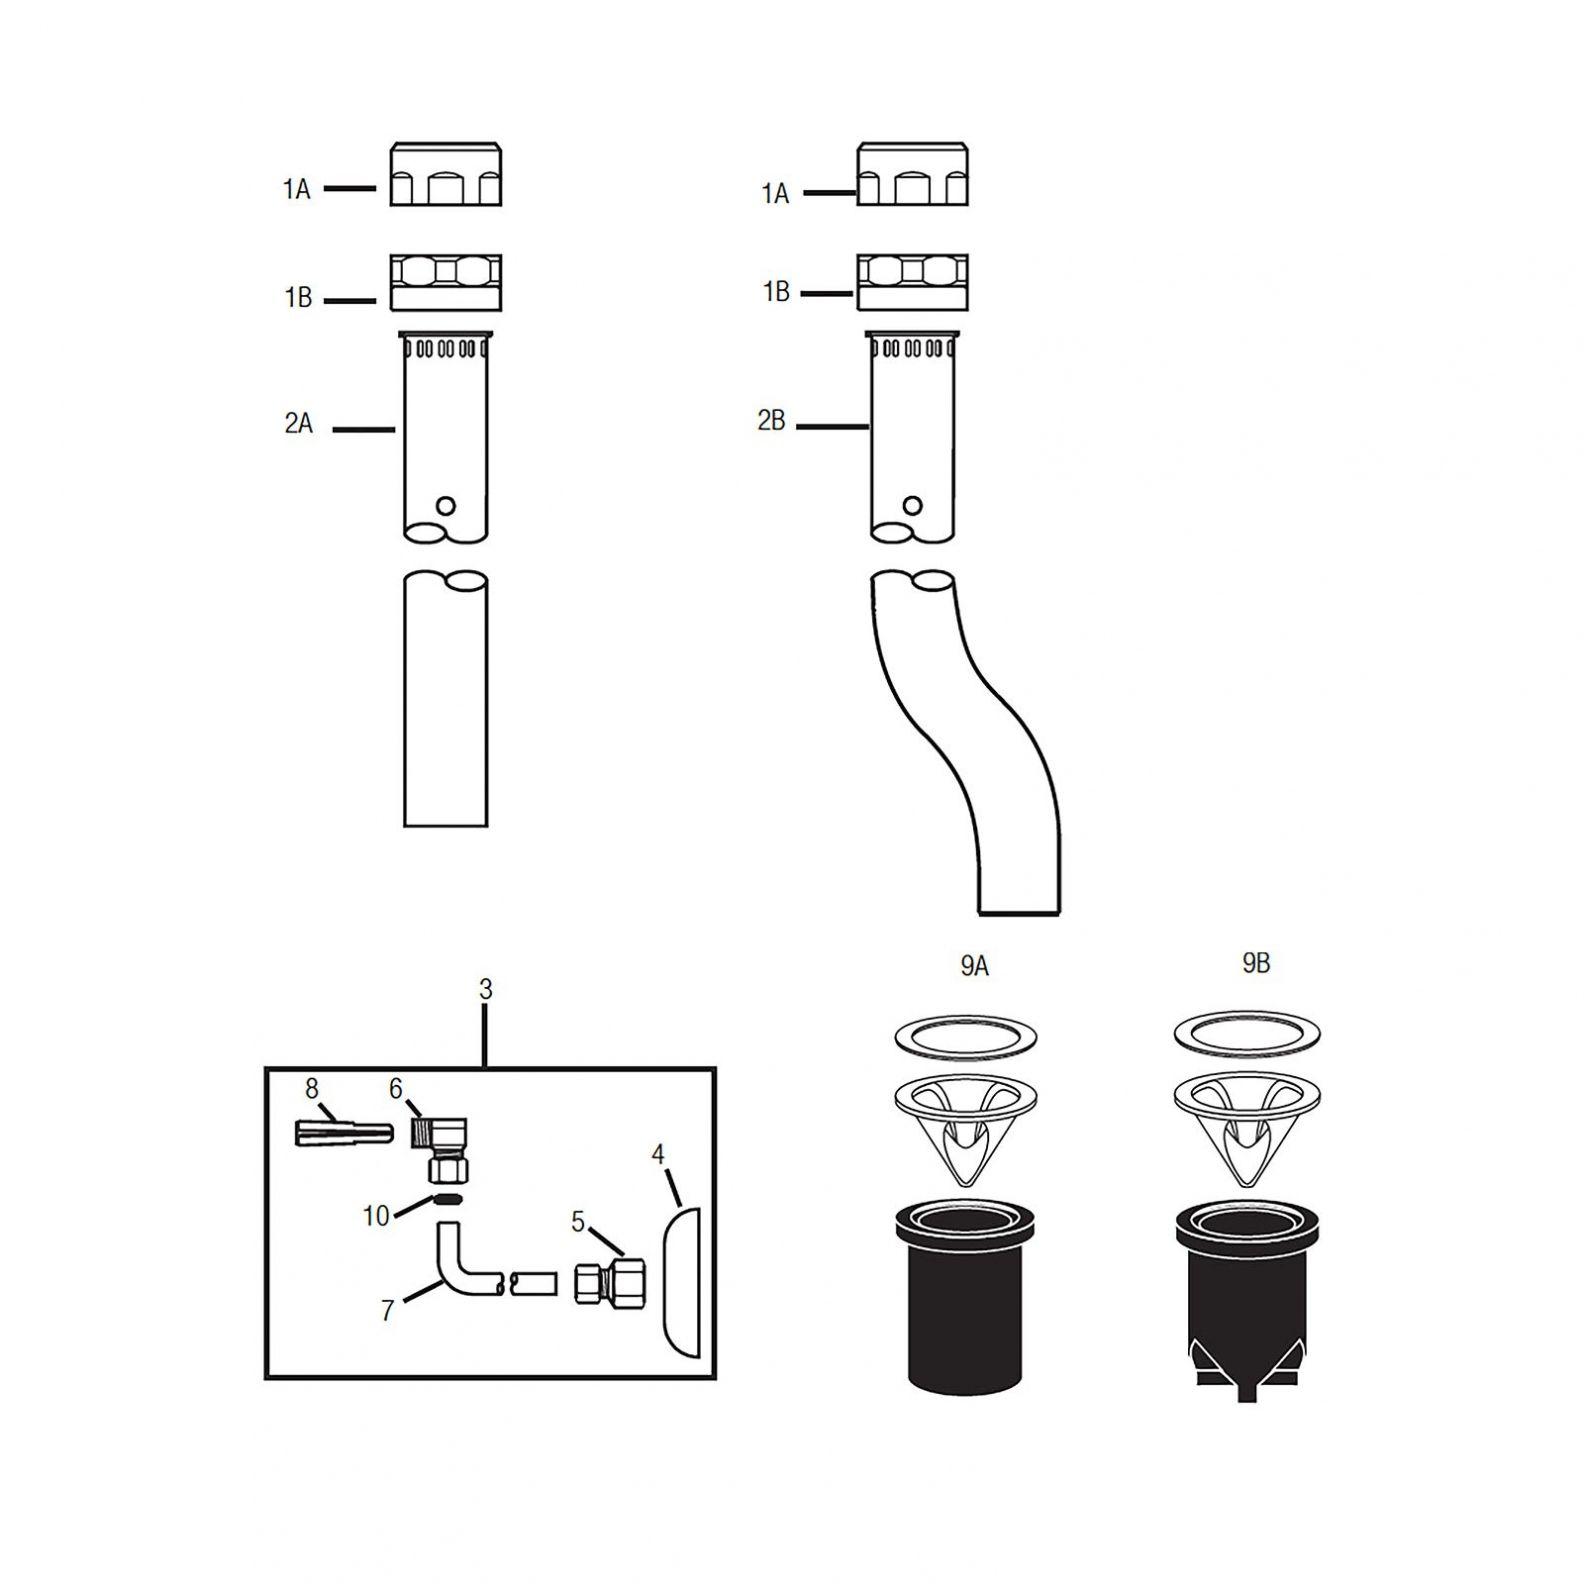 Plumbing Riser Diagram Software Wiring Diagram